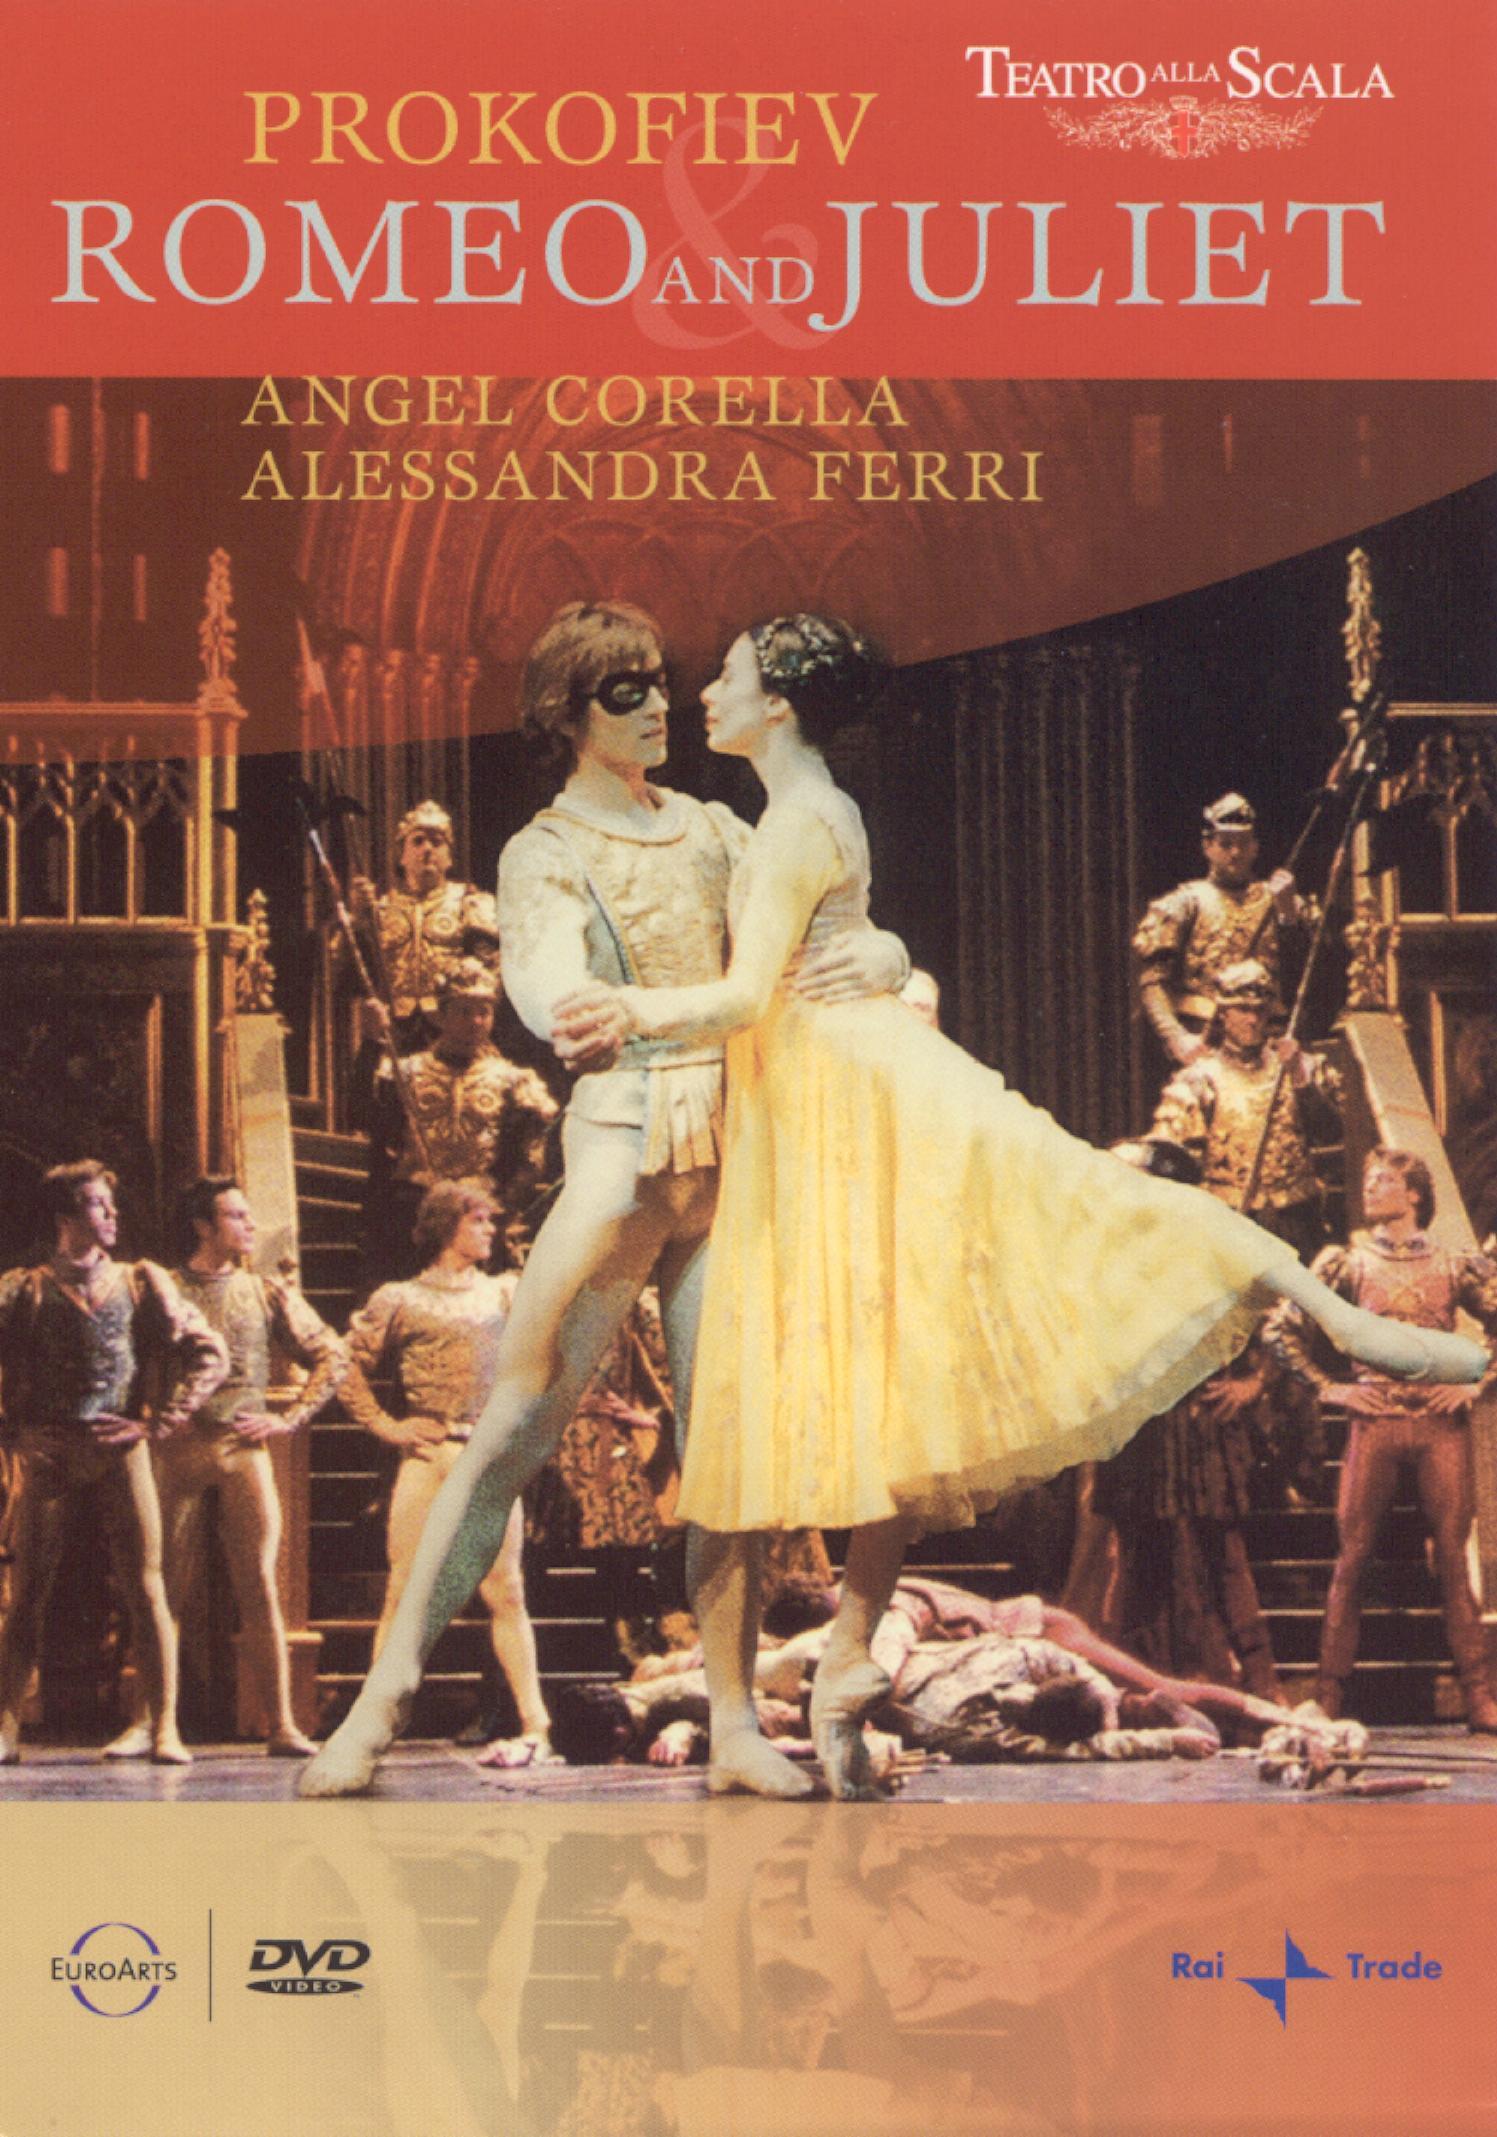 Romeo and Juliet (Teatro alla Scala)